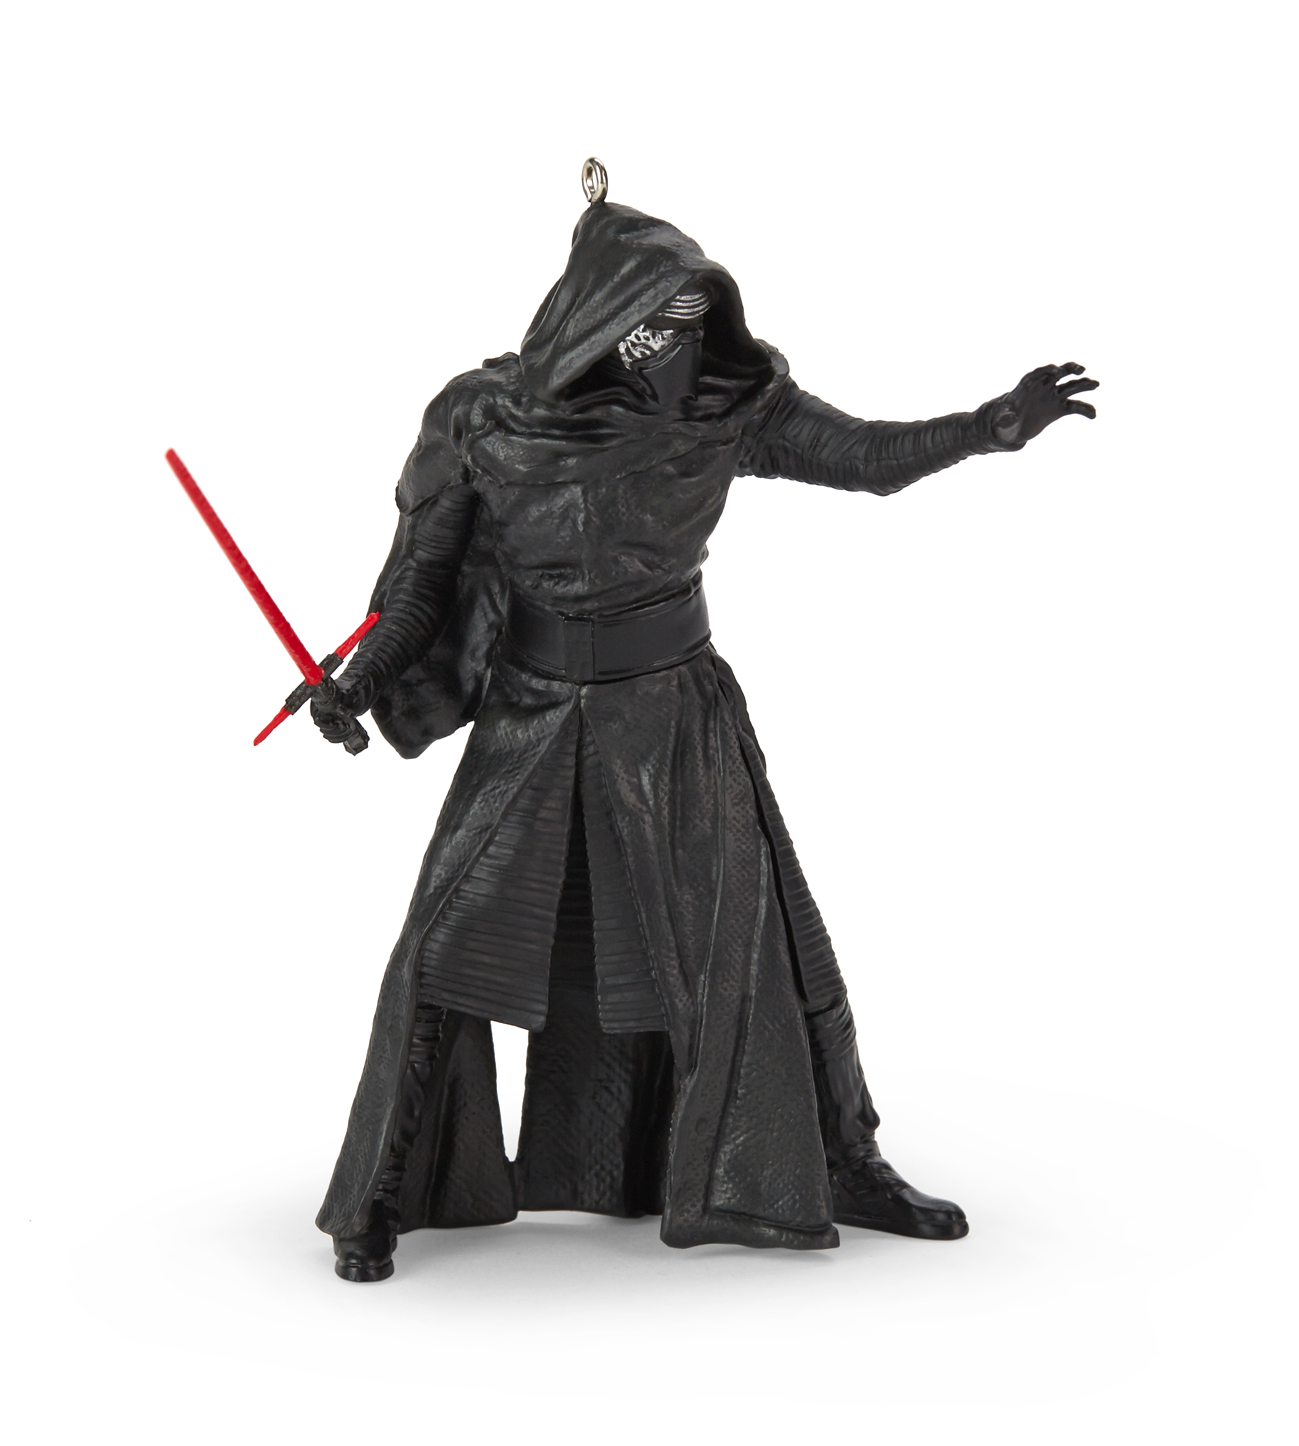 Hallmark 2016 Han Sole Star Wars  The Force Awakens Ornament